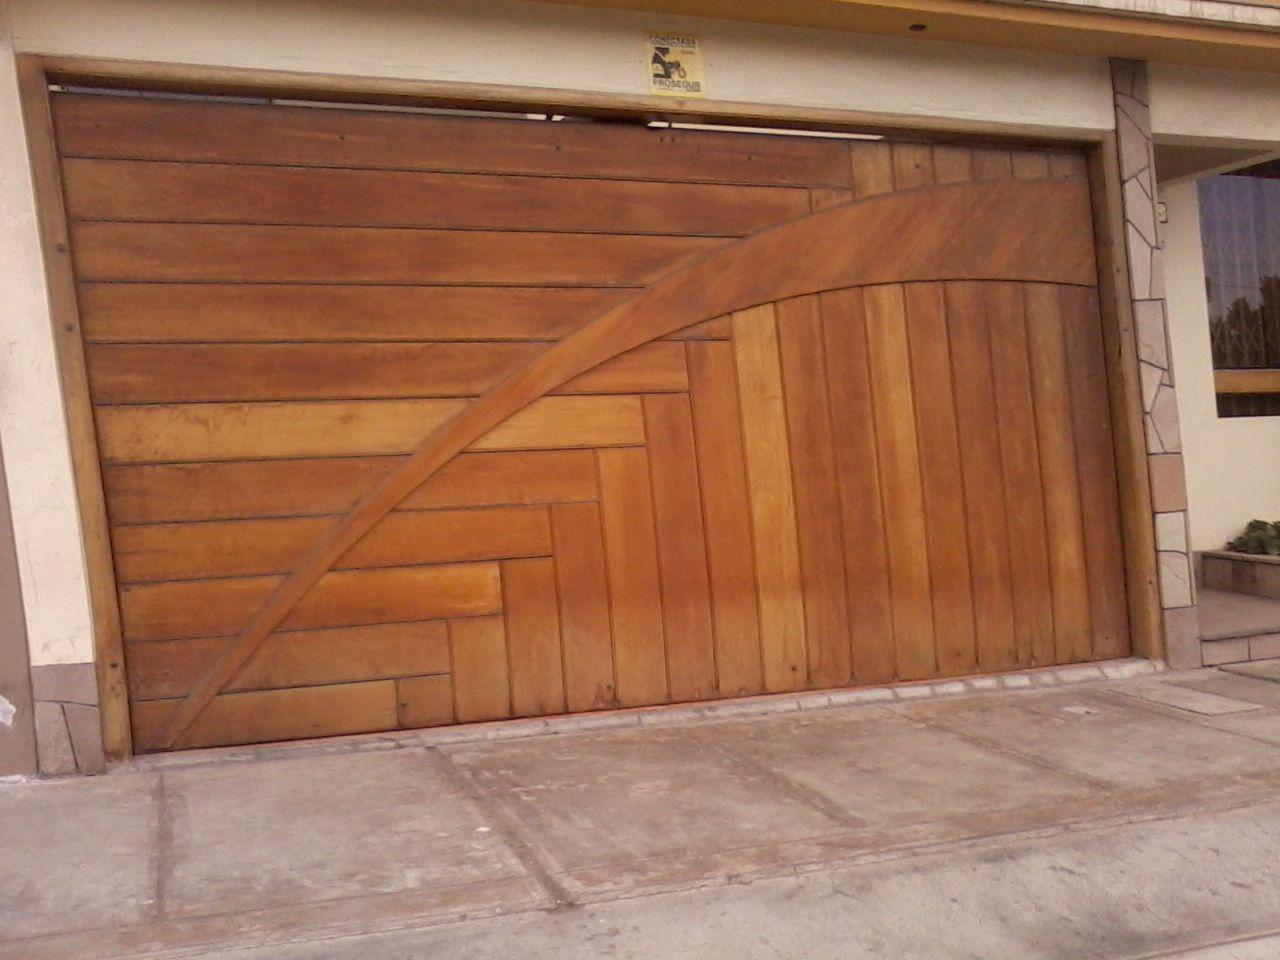 Porton de madera portones de madera pinterest for Puertas y portones de madera